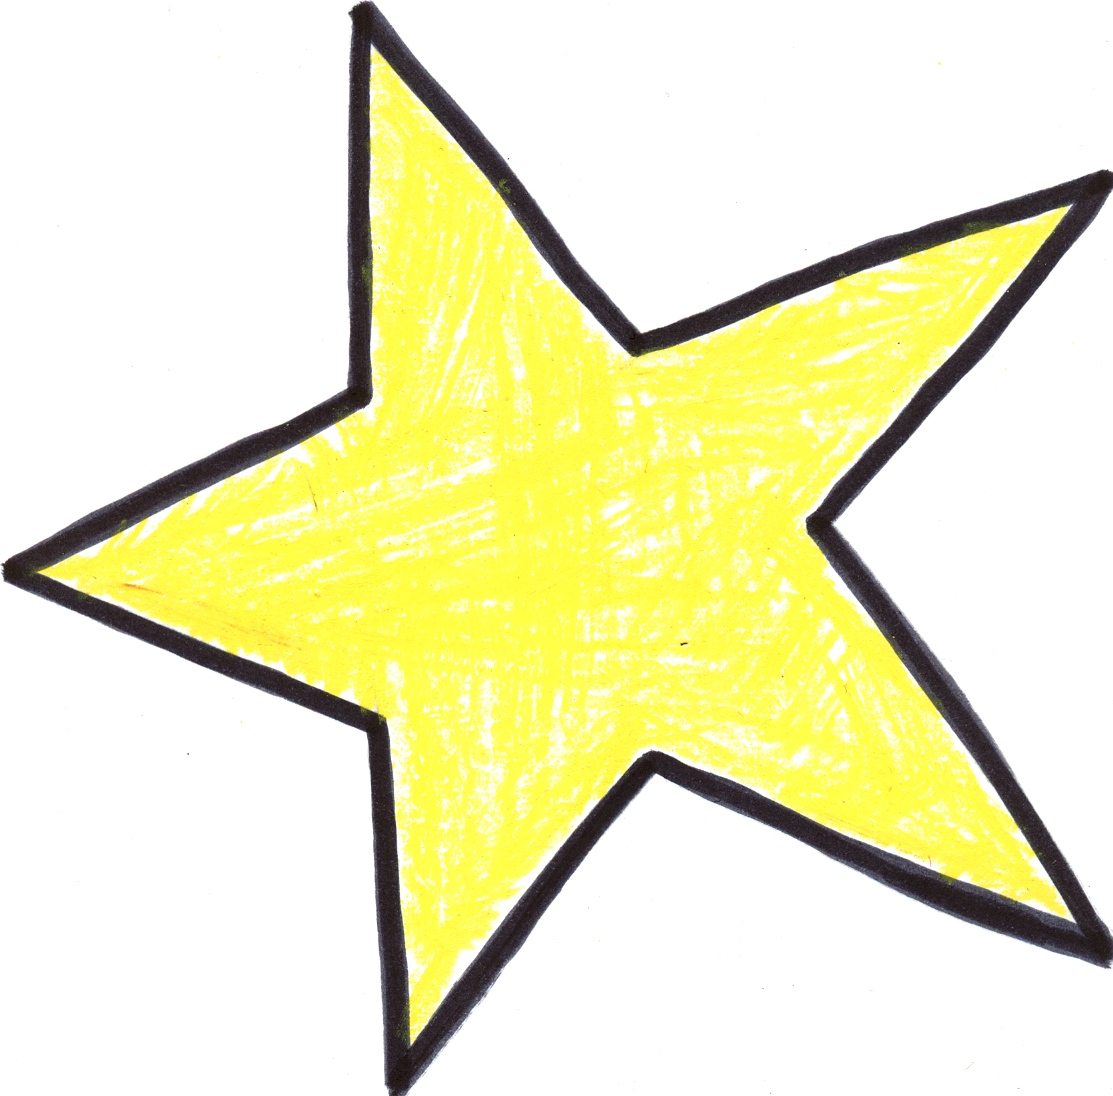 1113x1096 Star Clip Art For Teachers Free Clipart Images